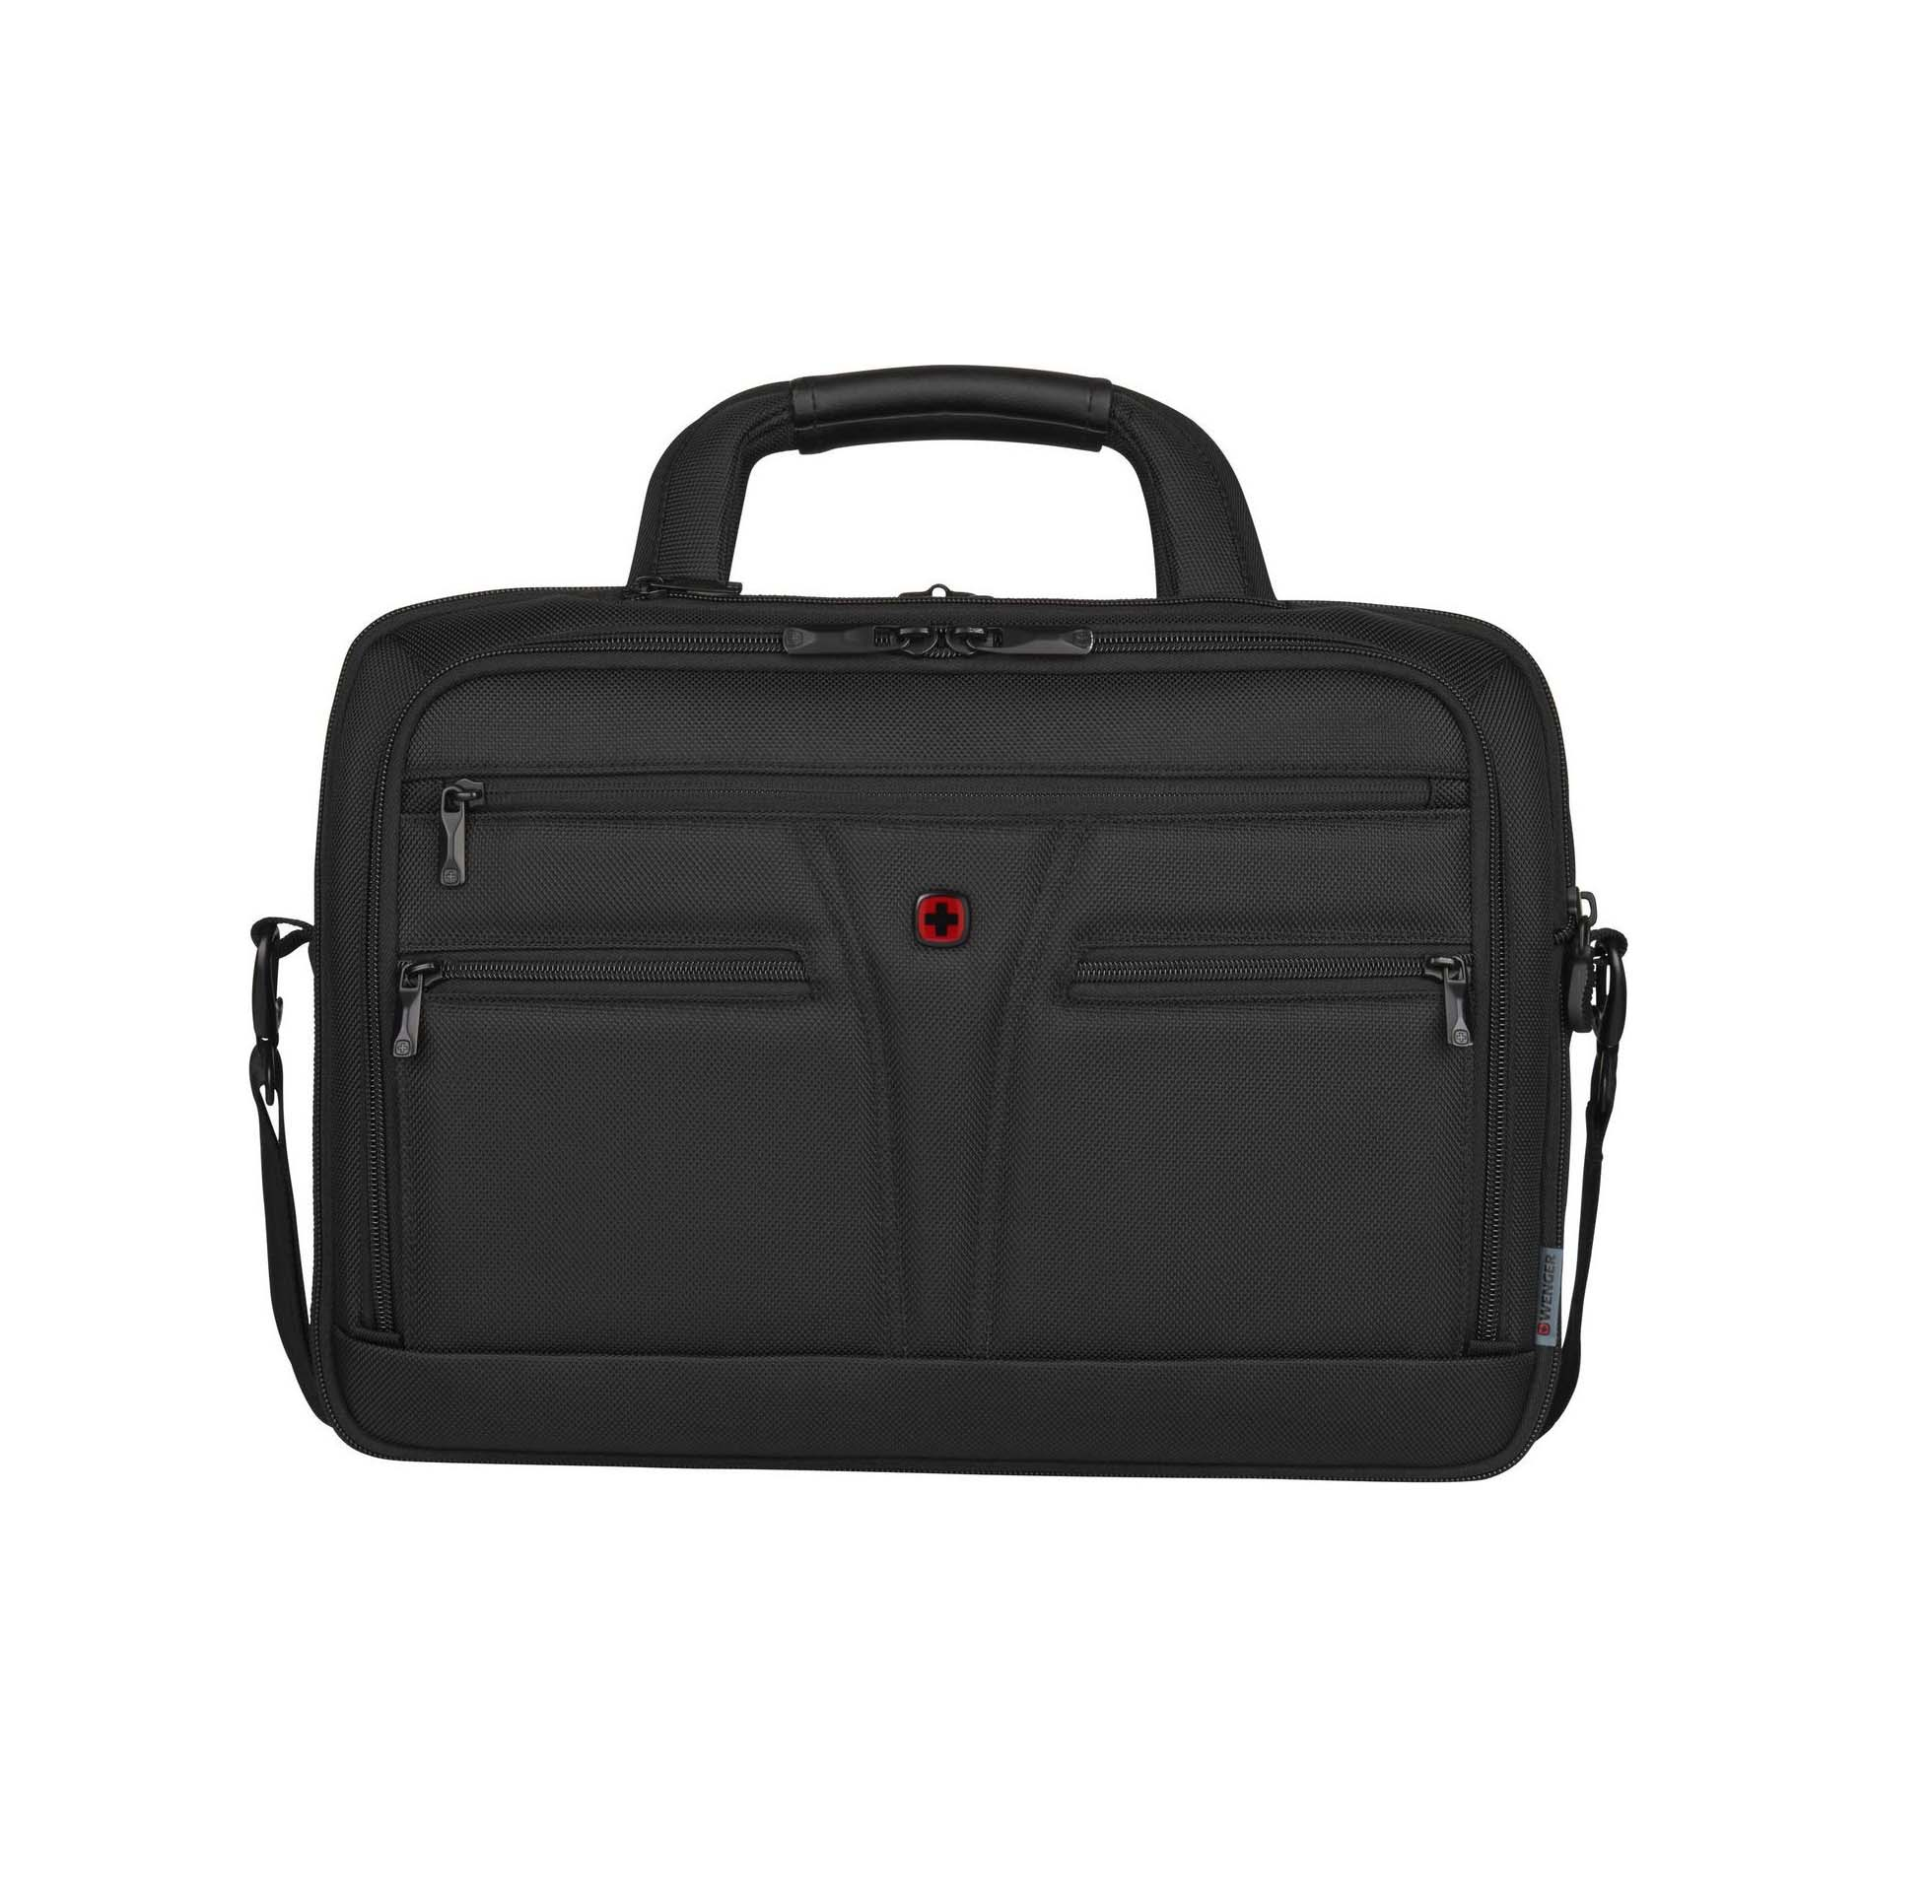 "Wenger BC Star Τσάντα Ώμου / Χειρός για Laptop 16"" 606465 Black"